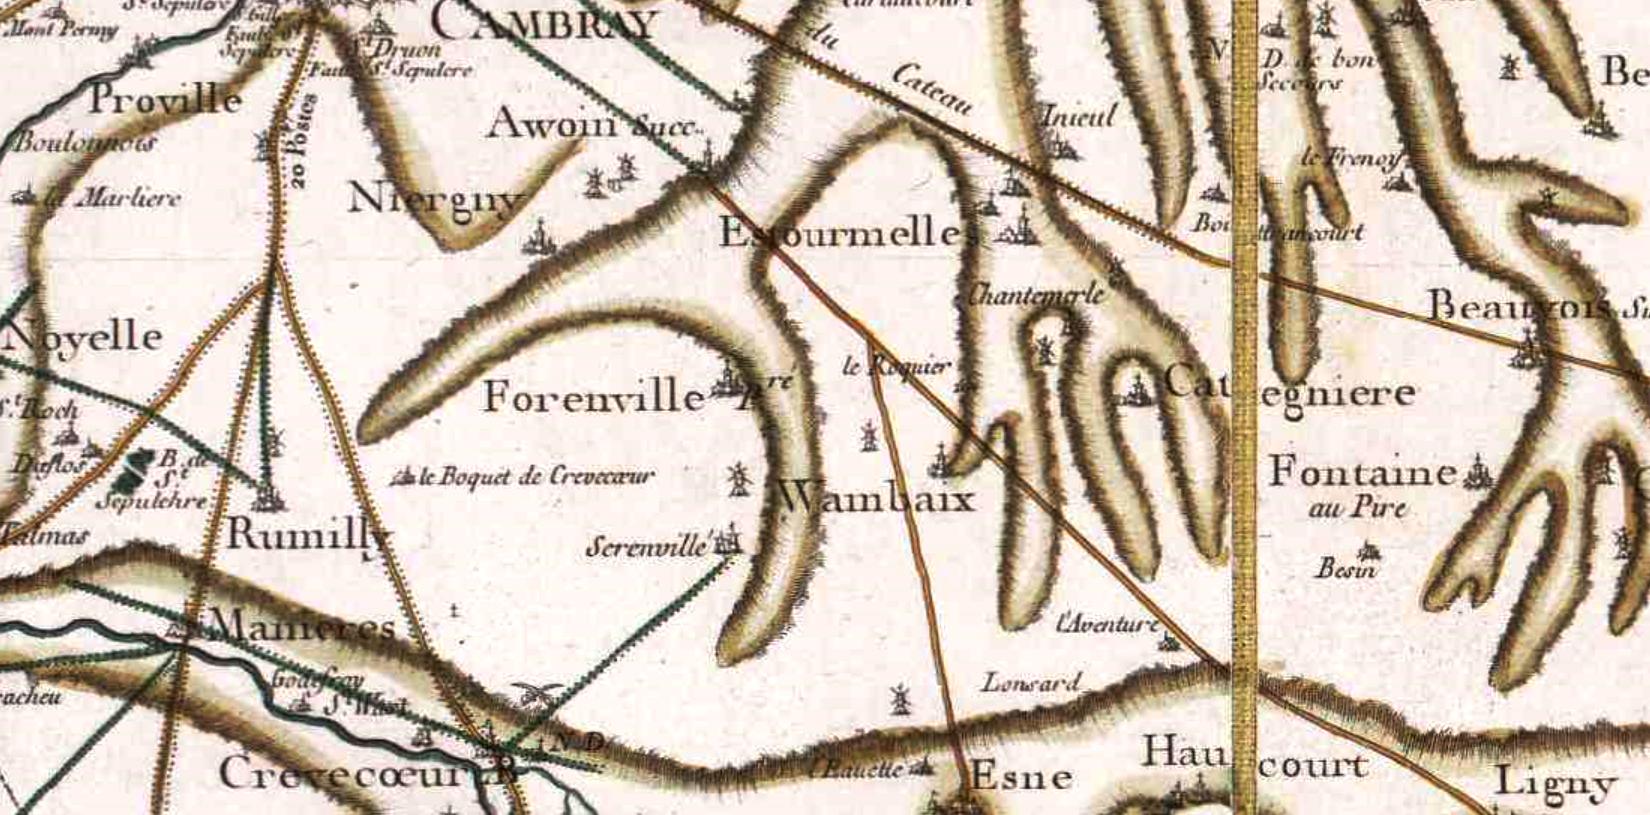 Wambaix 59 cassini